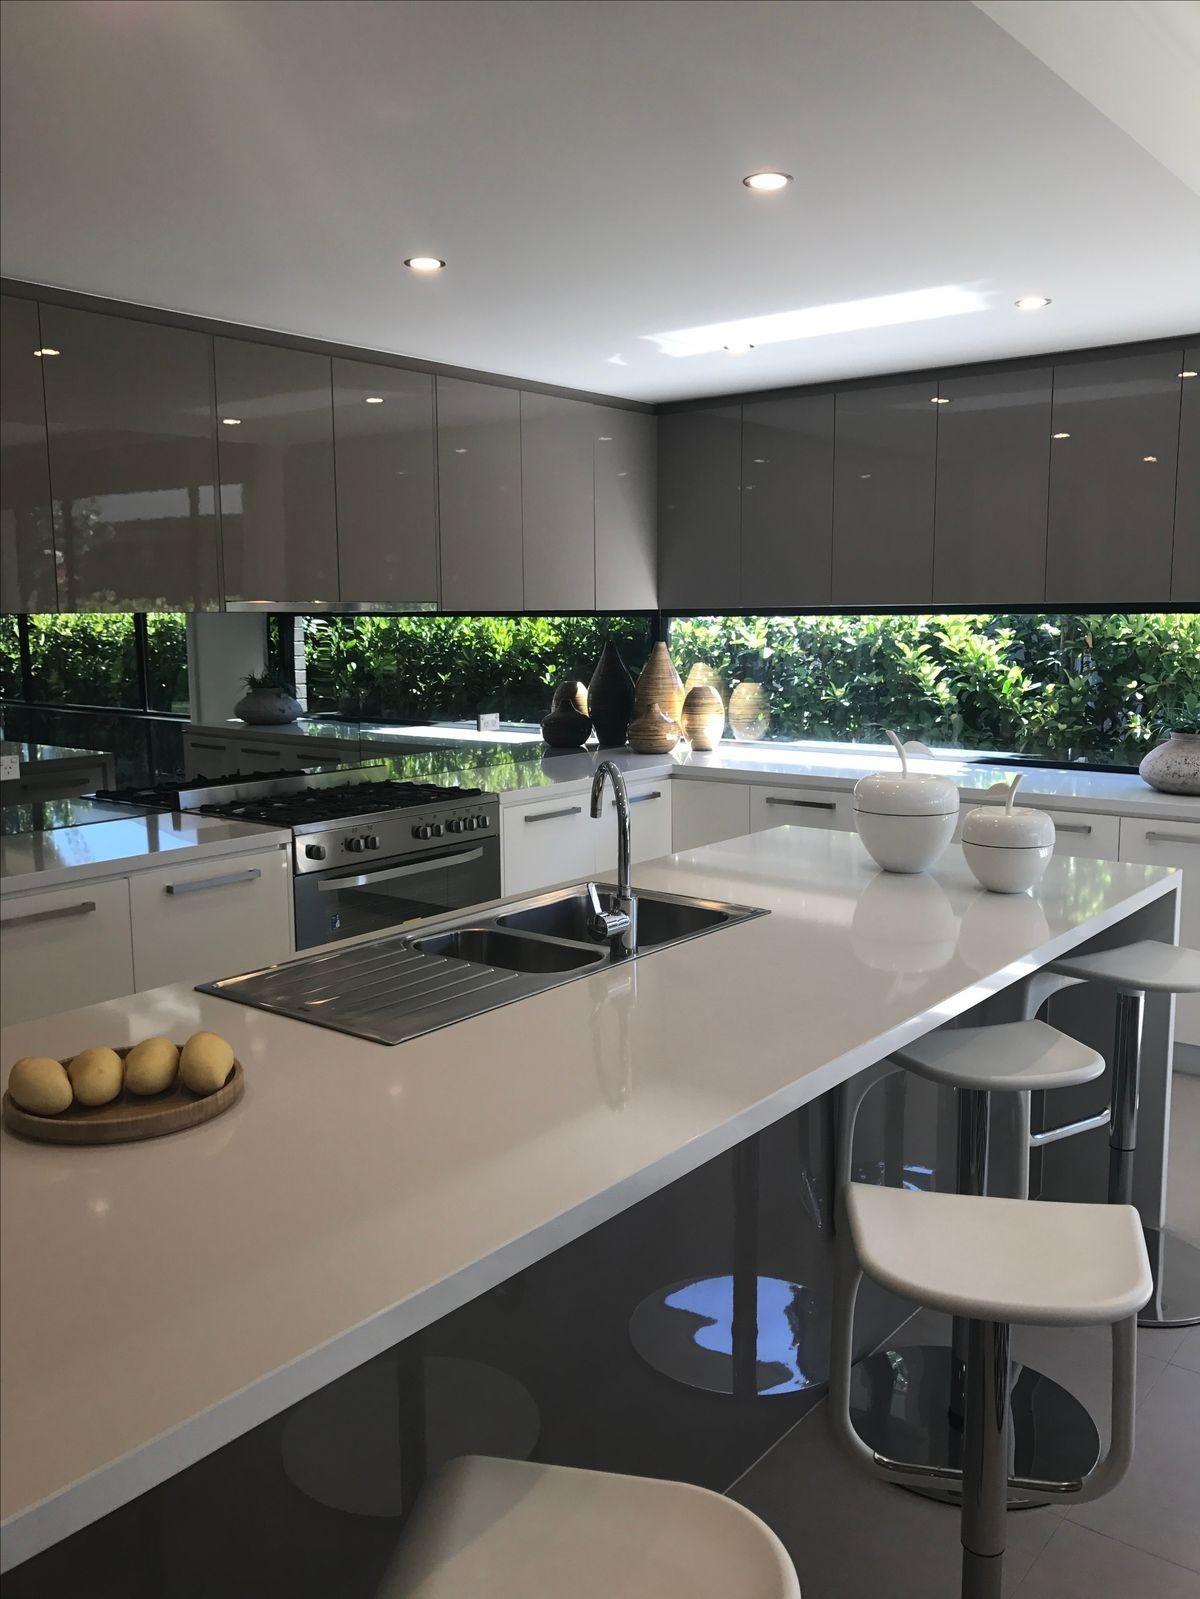 Cocinas Blancas Modernas Con Isla En La Cocina Kitchen Pinterest